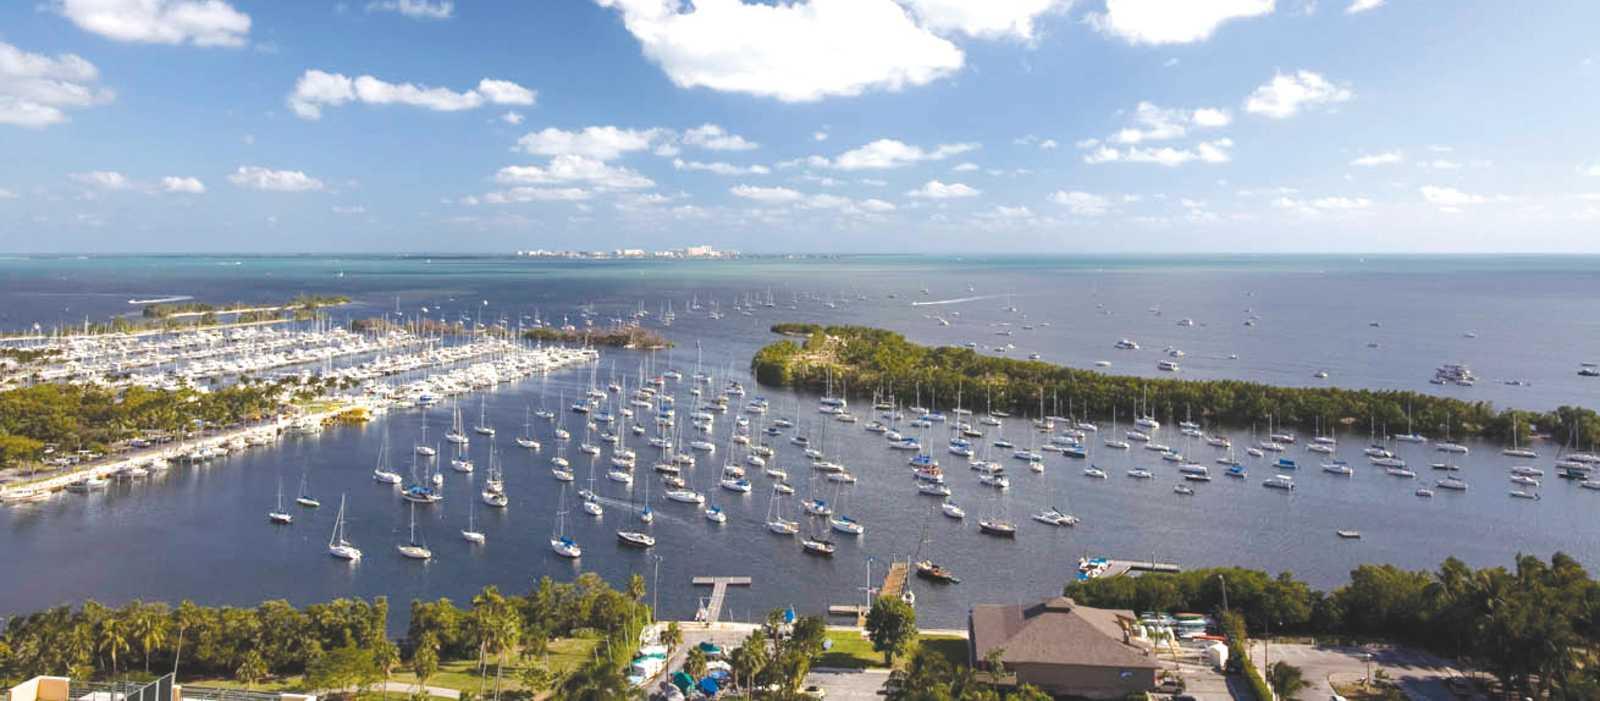 Miami Coconut Grove Marina Aerial